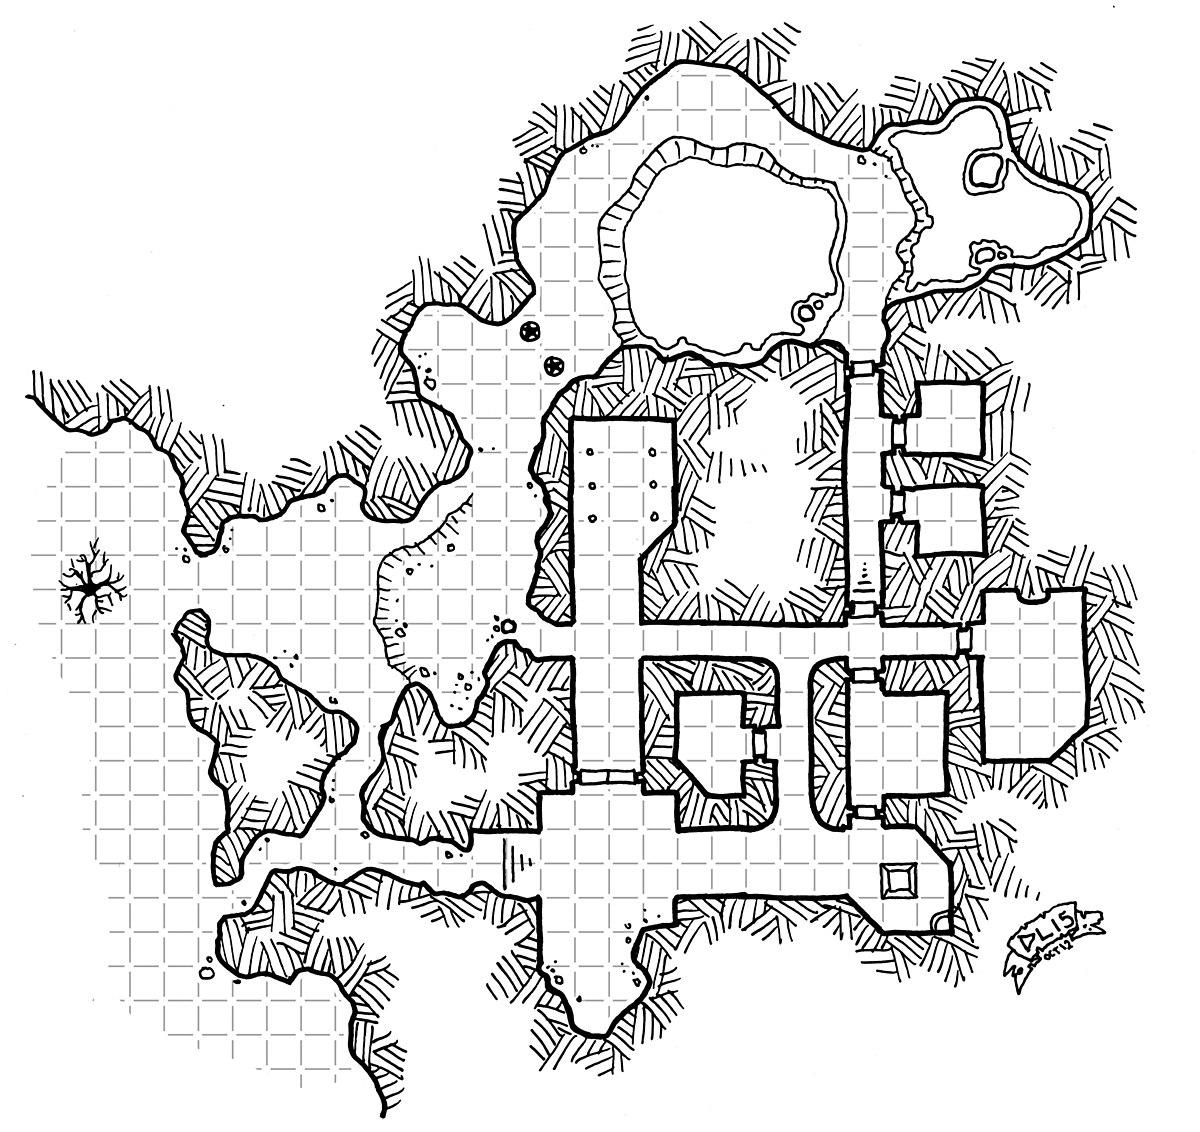 Dungeon crawl - Wikipedia